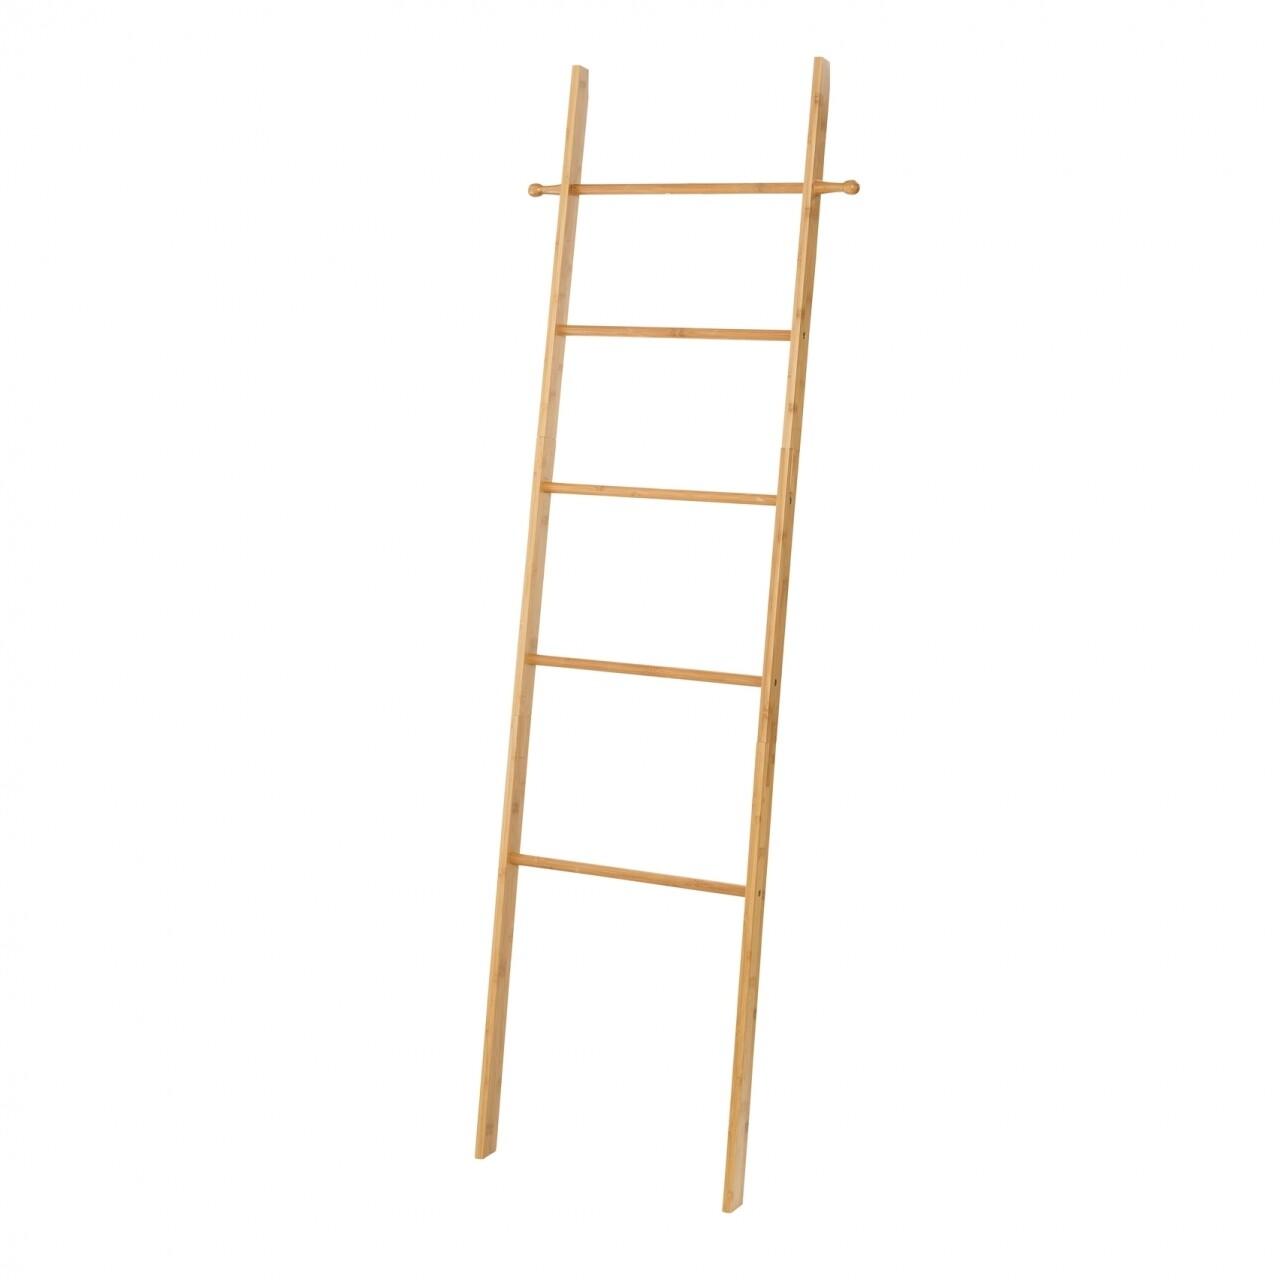 Suport pentru rufe si prosoape Ladder, Wenko, 43 x 170 cm, bambus, natur